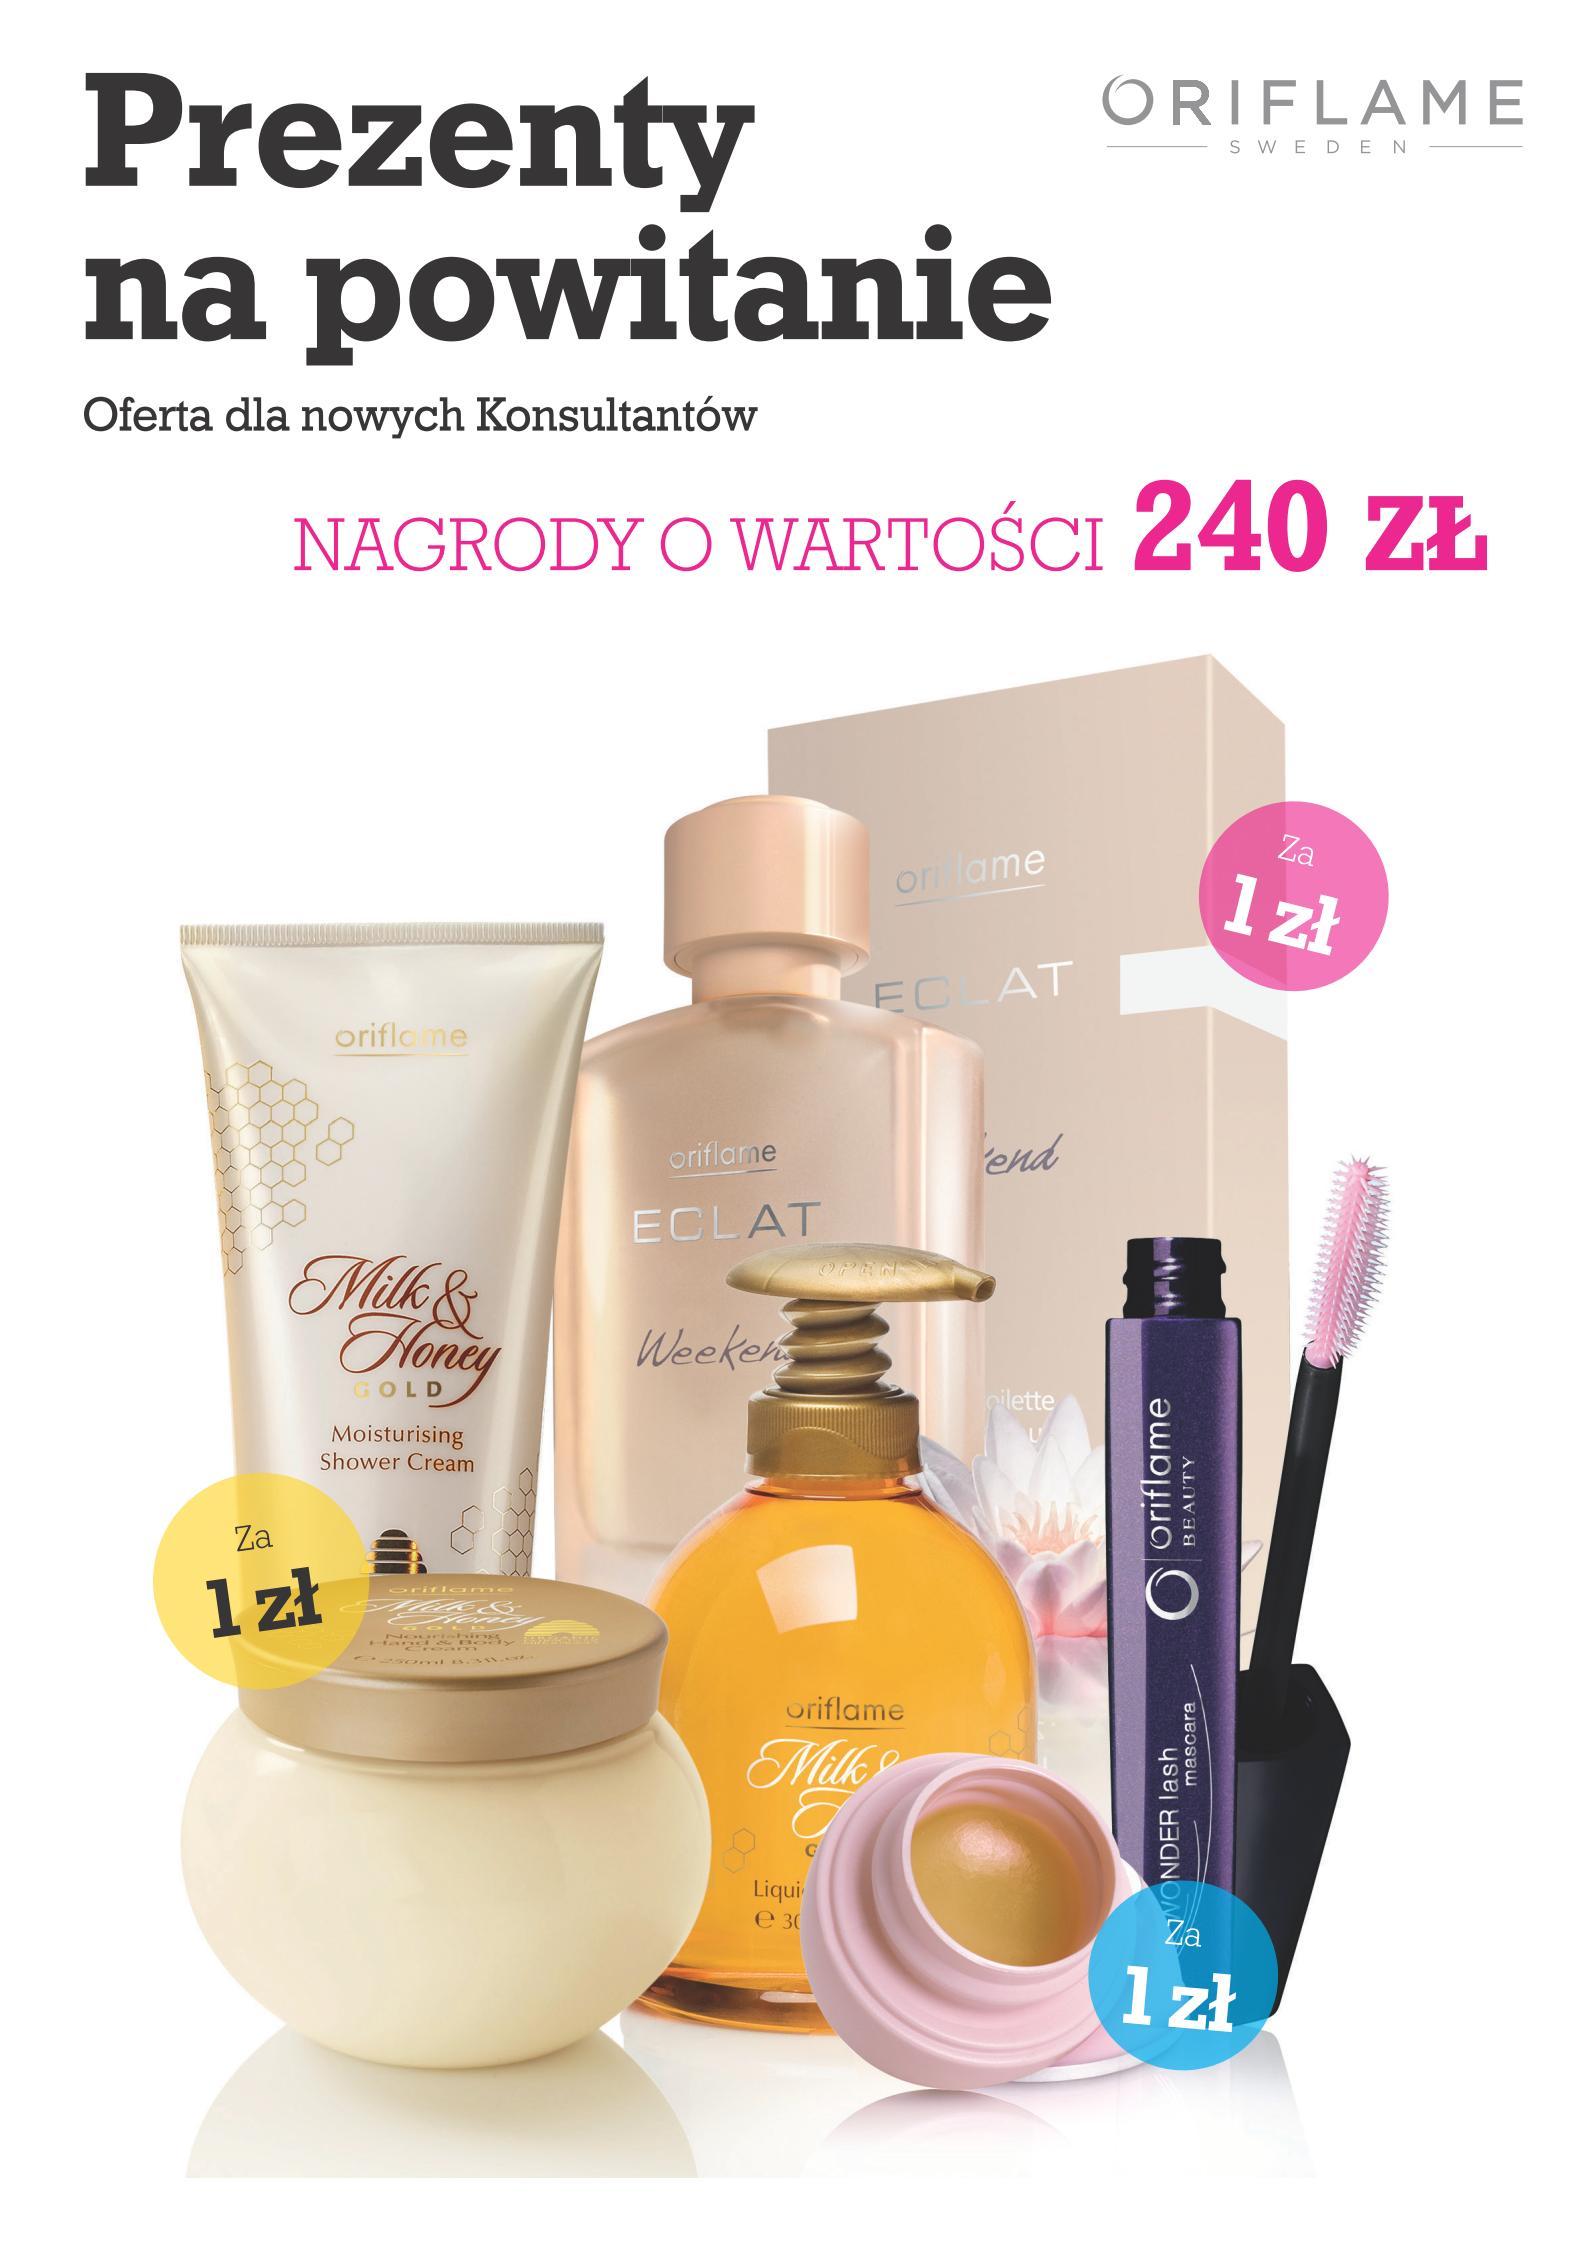 Katalog Oriflame 1 2014 Program Witamy